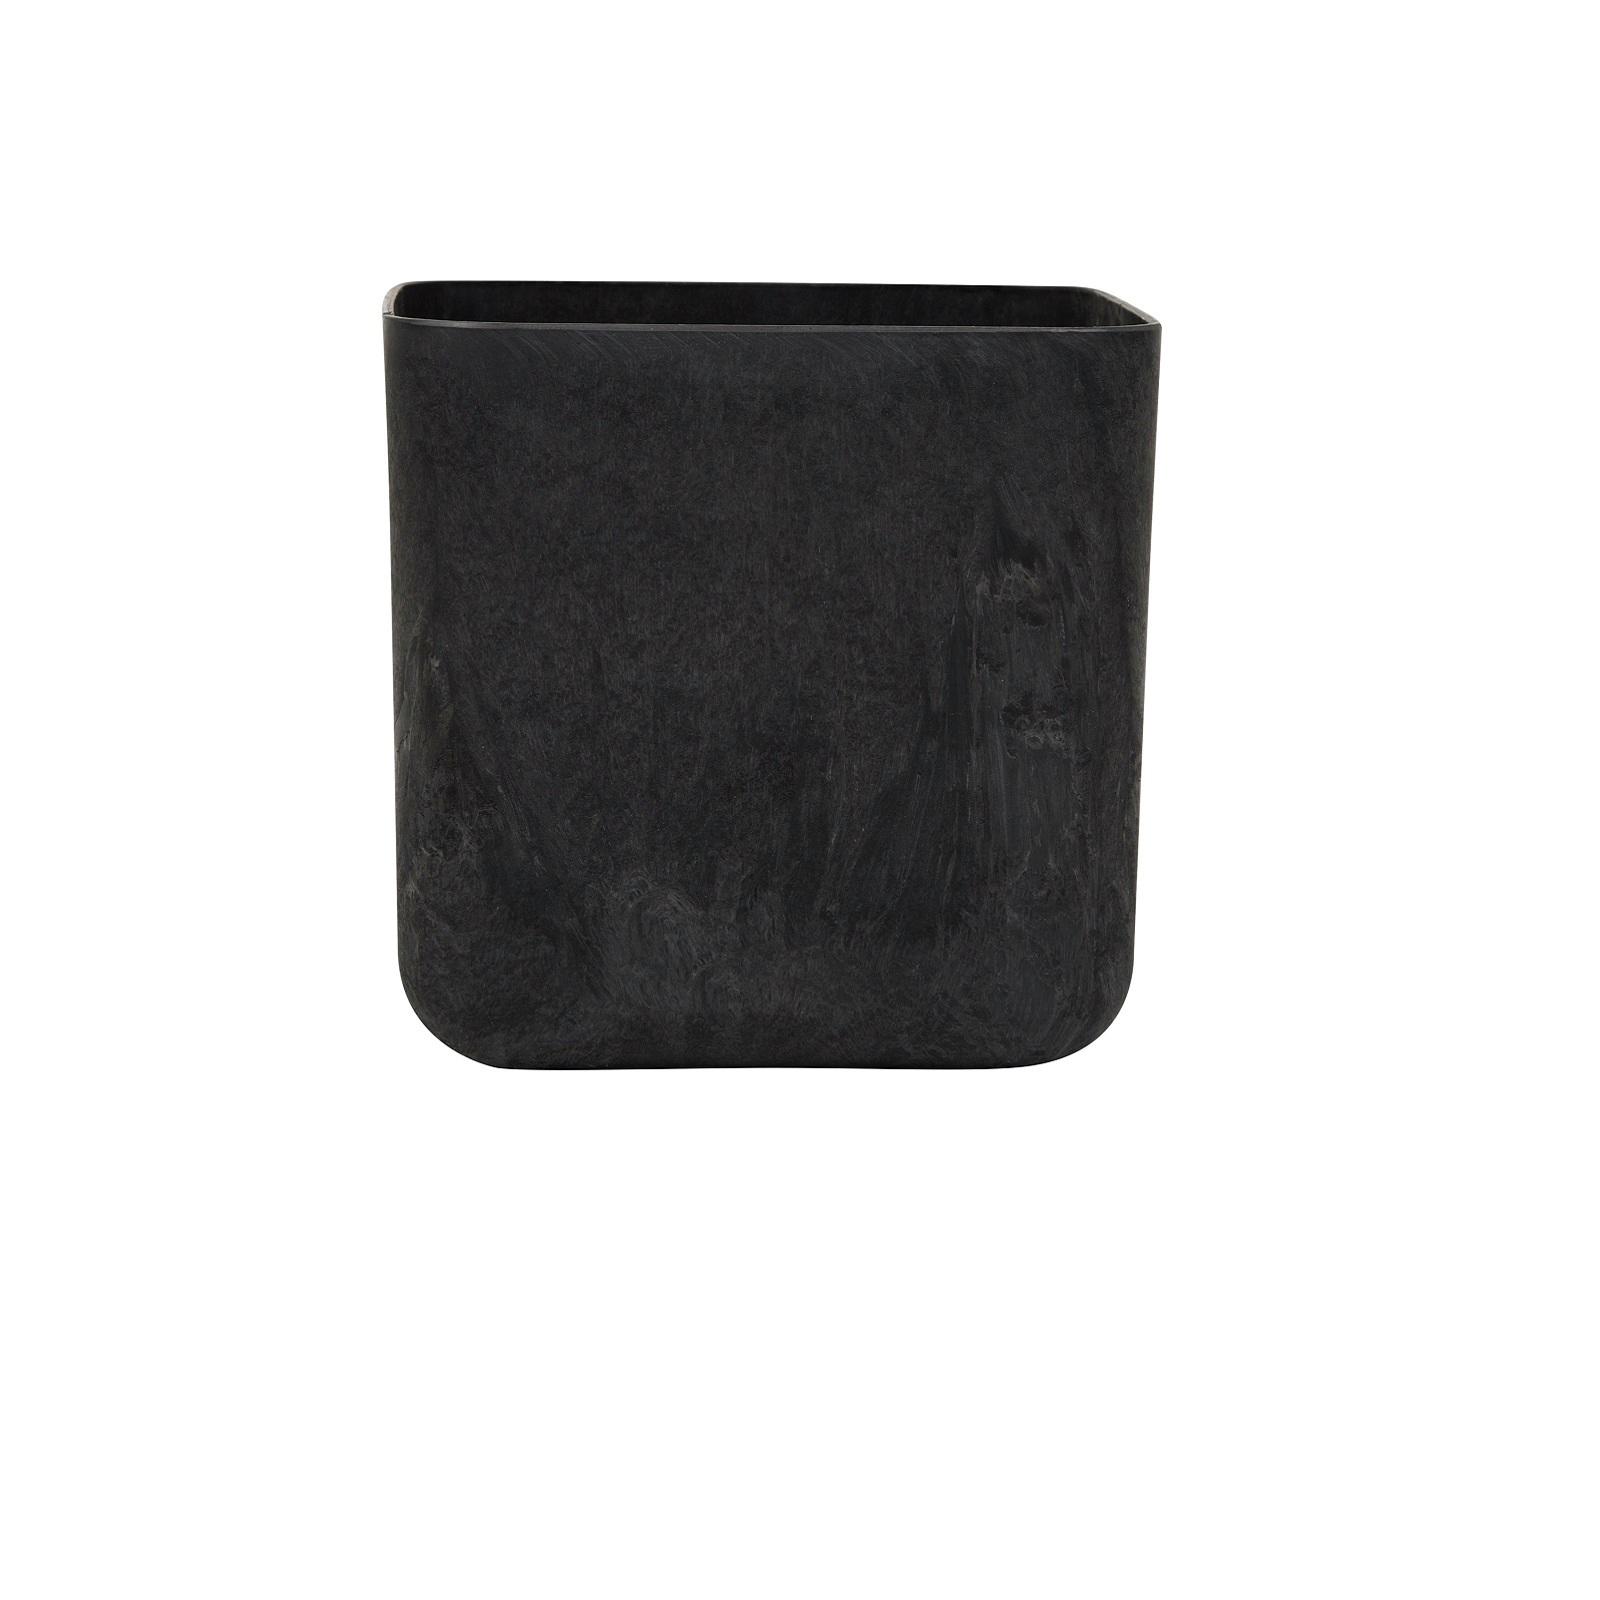 Tuscan Path Rubik Stone Art Pot - Black 200mm